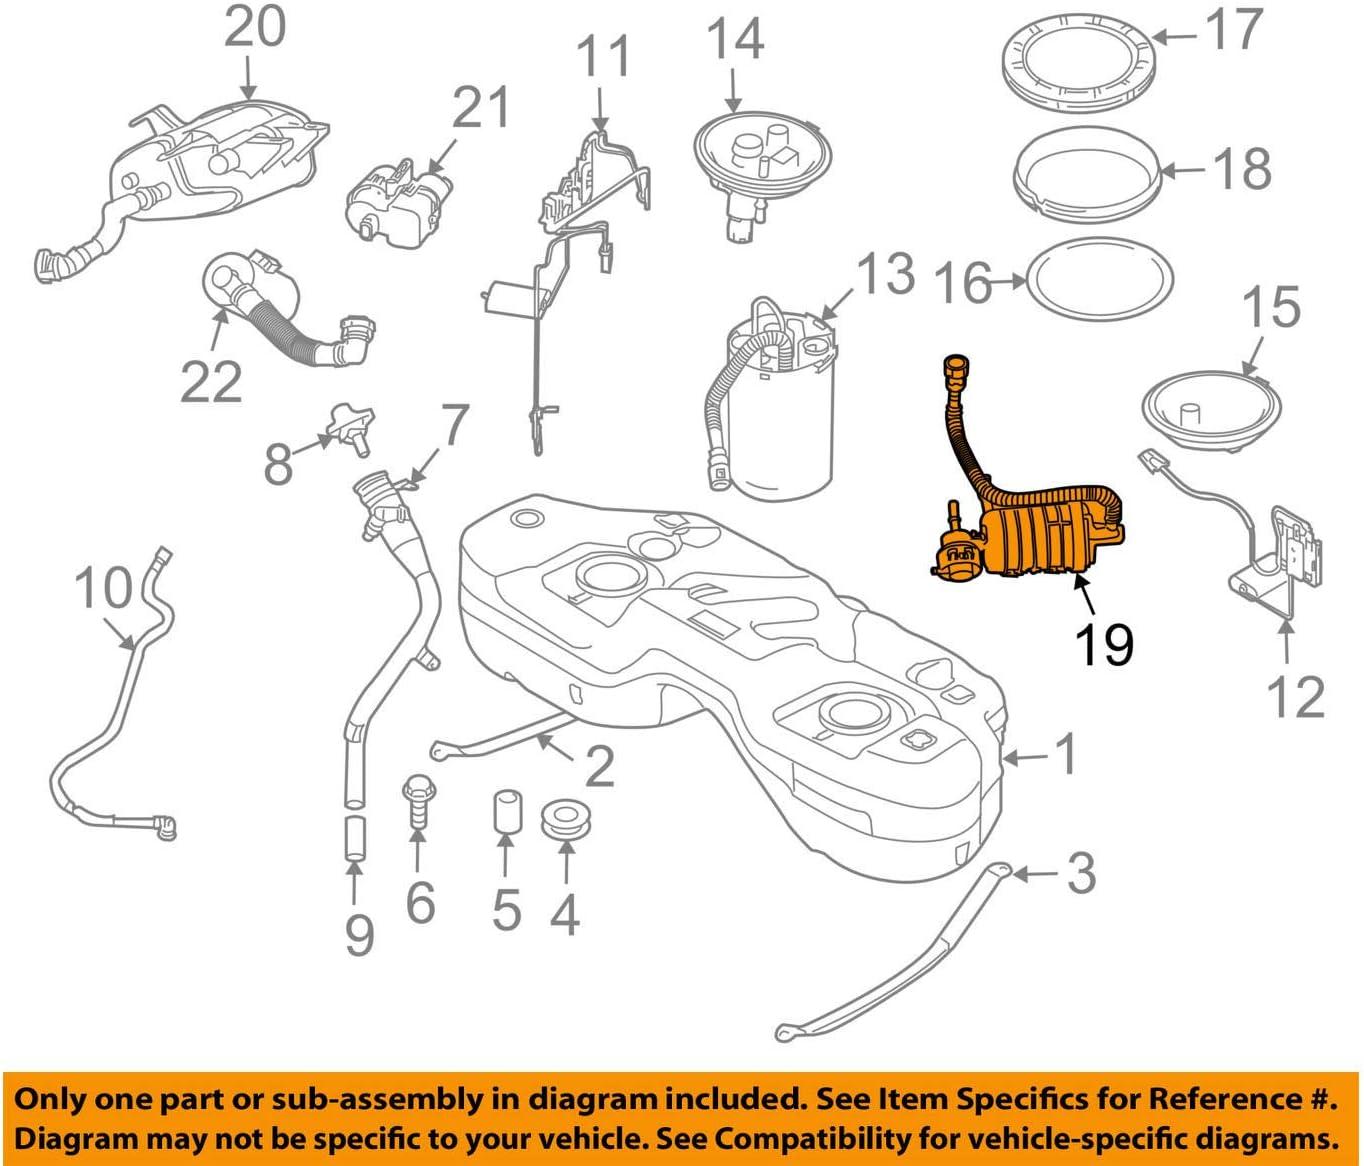 amazon.com: bmw 16-14-7-186-454 fuel filter with pre: automotive fuel filter diagram  amazon.com